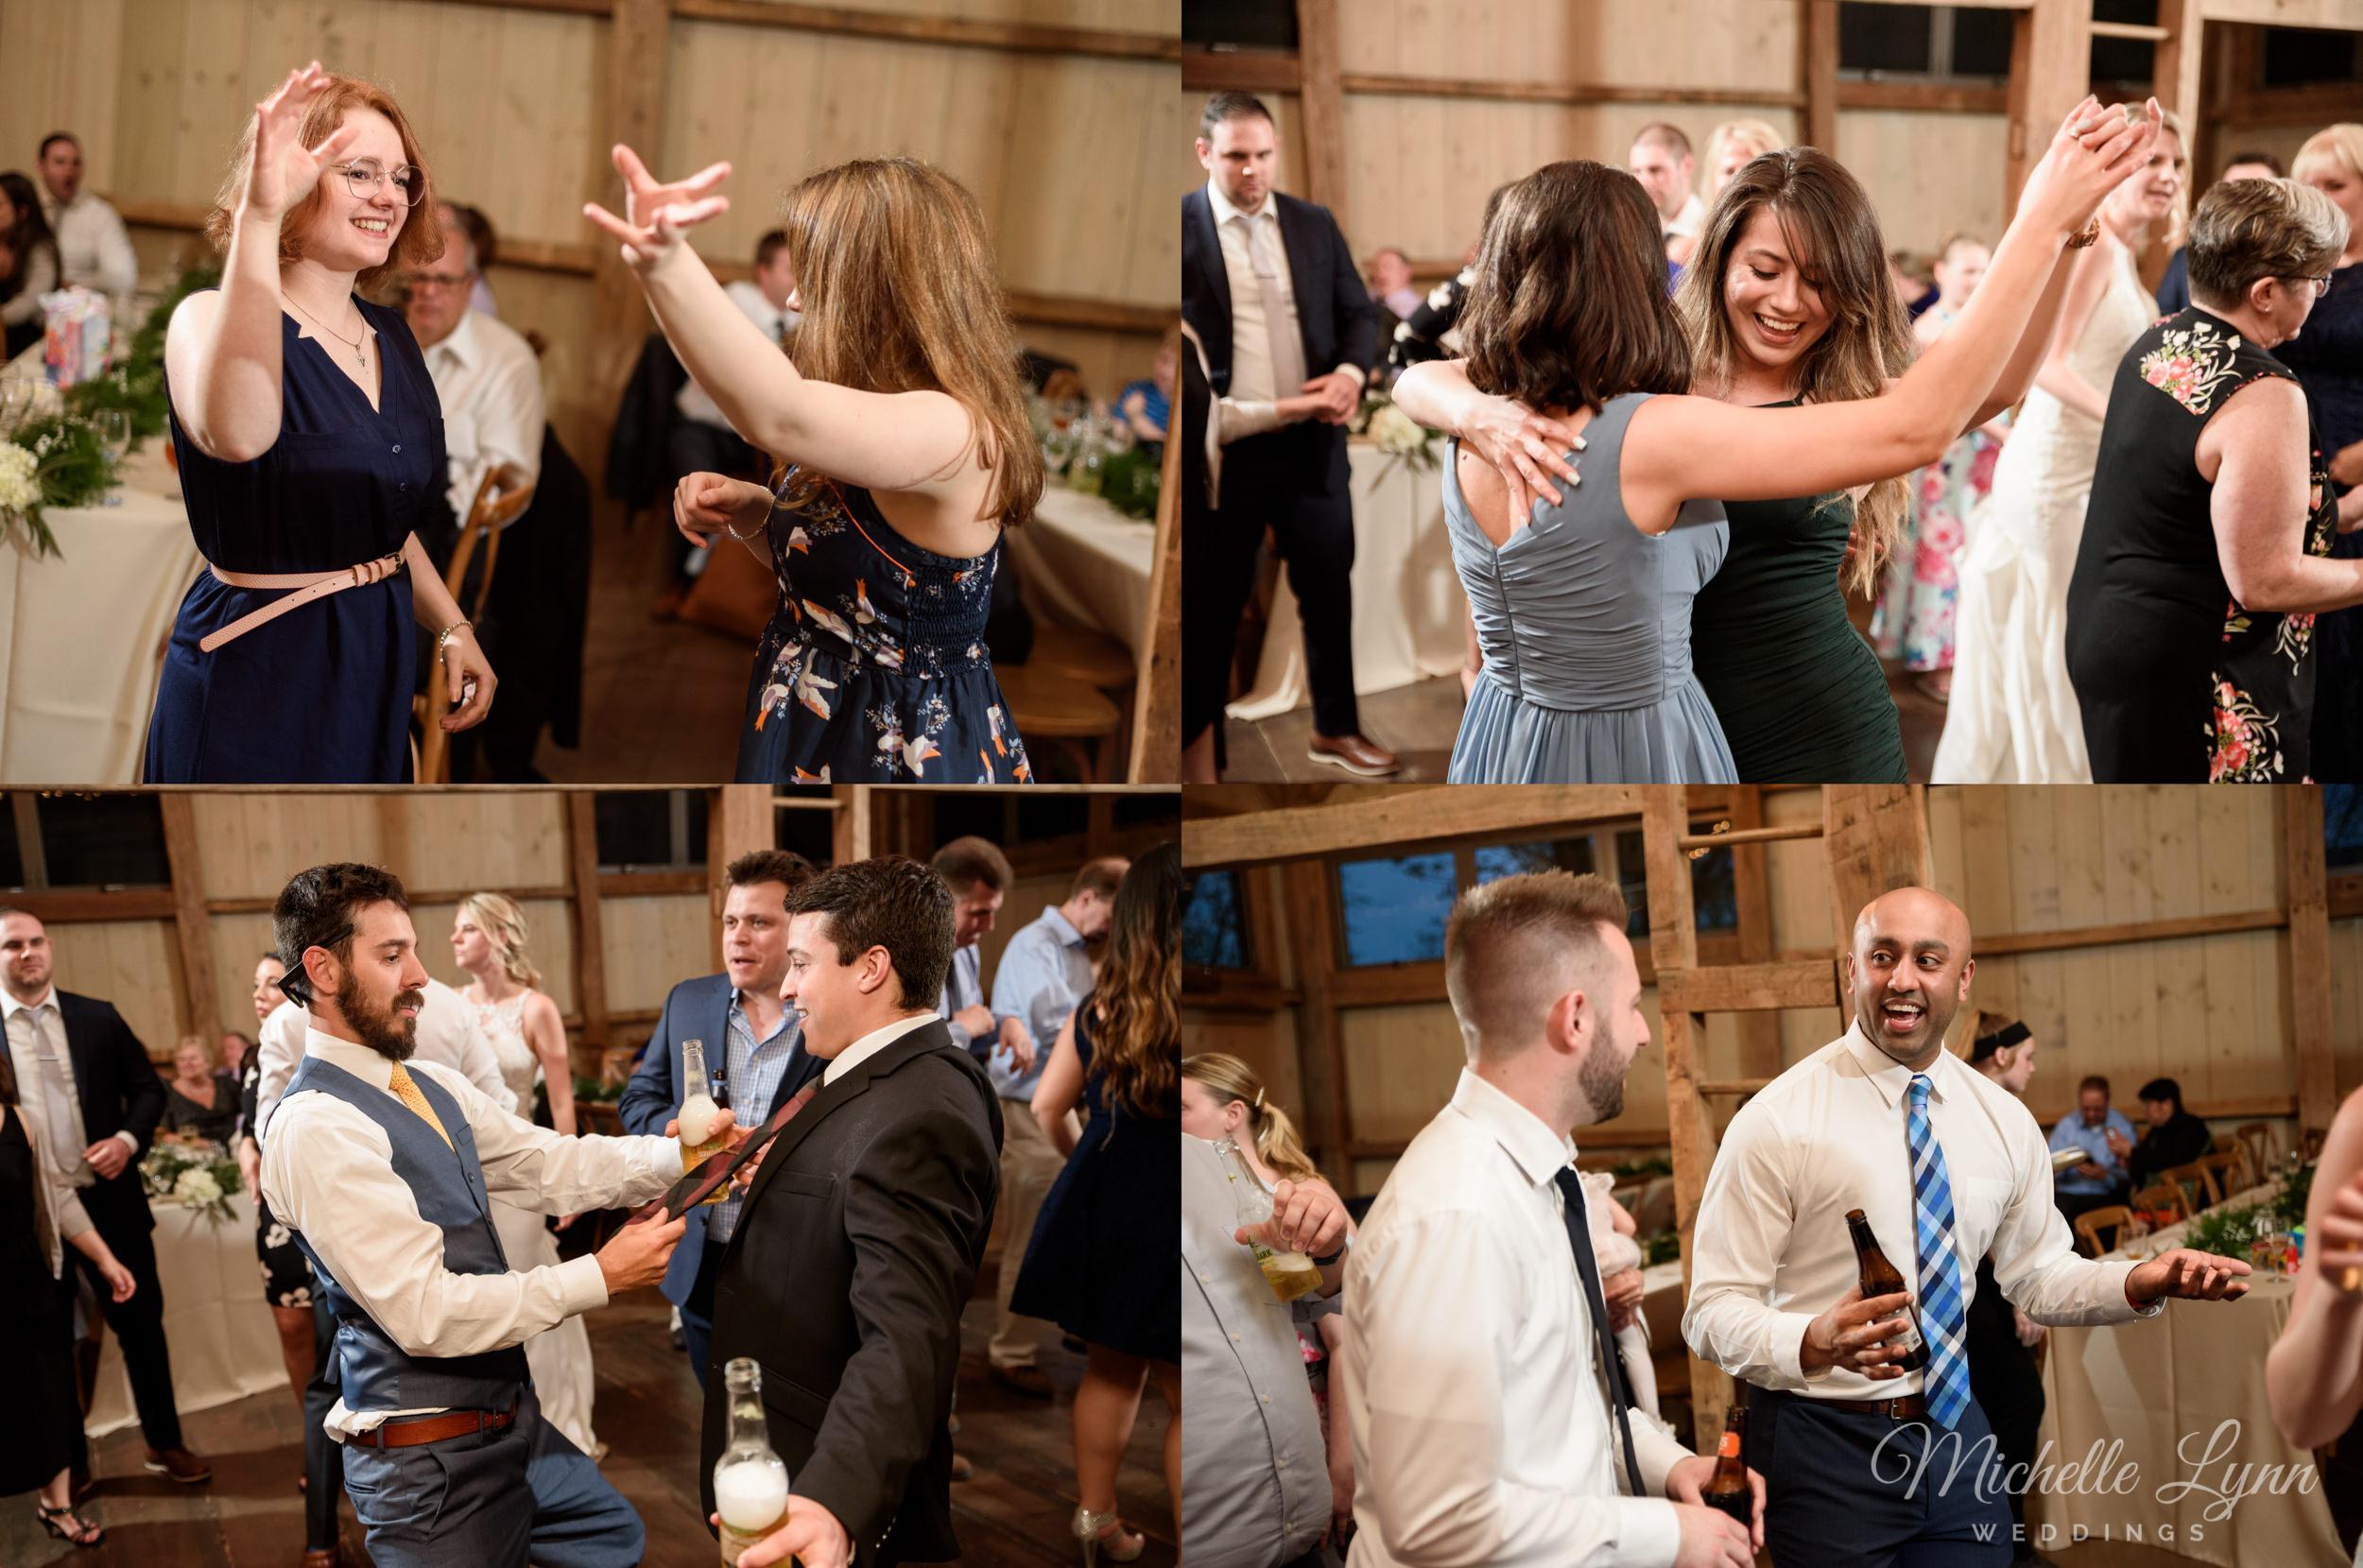 mlw-the-farm-bakery-and-events-wedding-photos-77.jpg